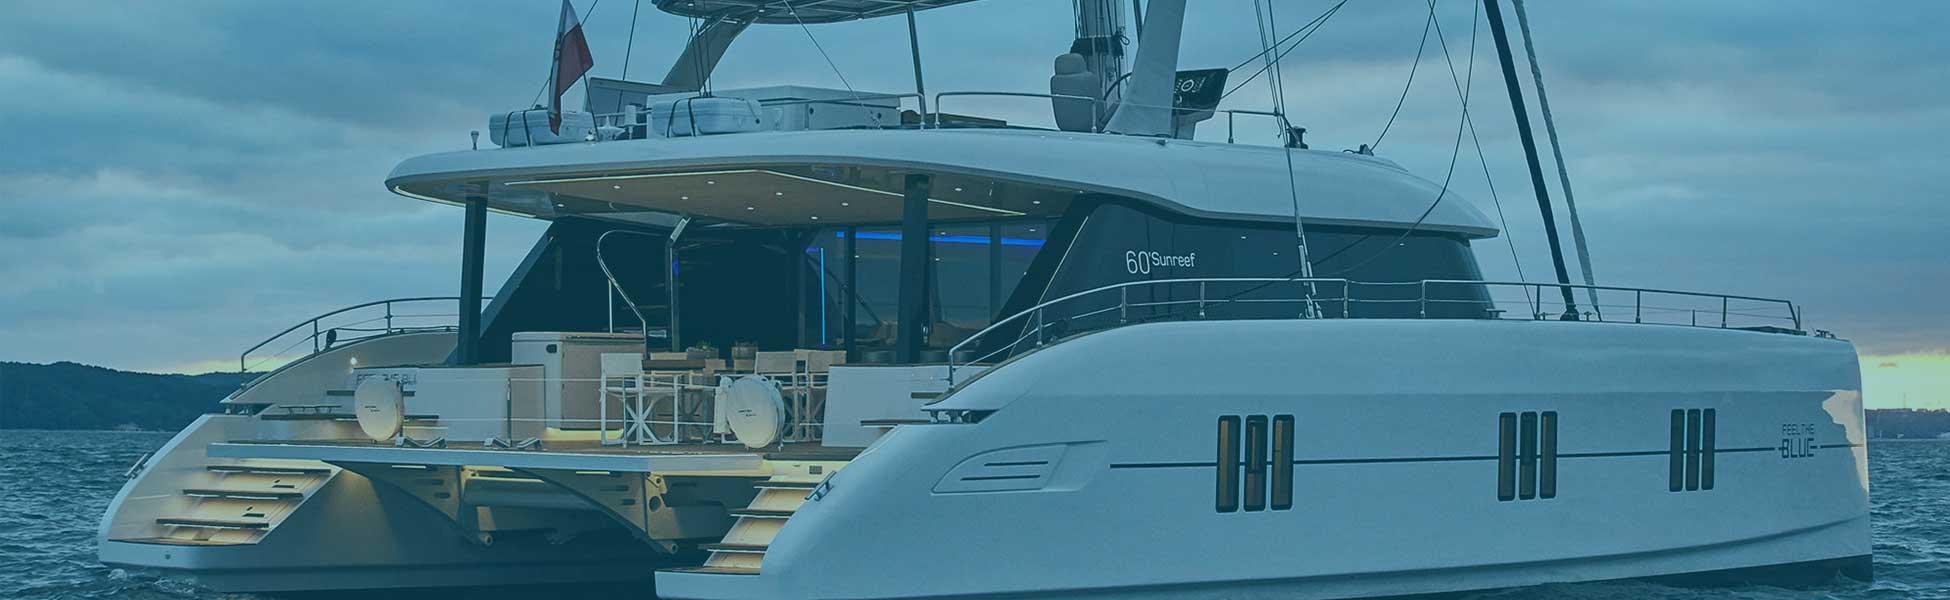 New Catamara Croatia Charter Slider